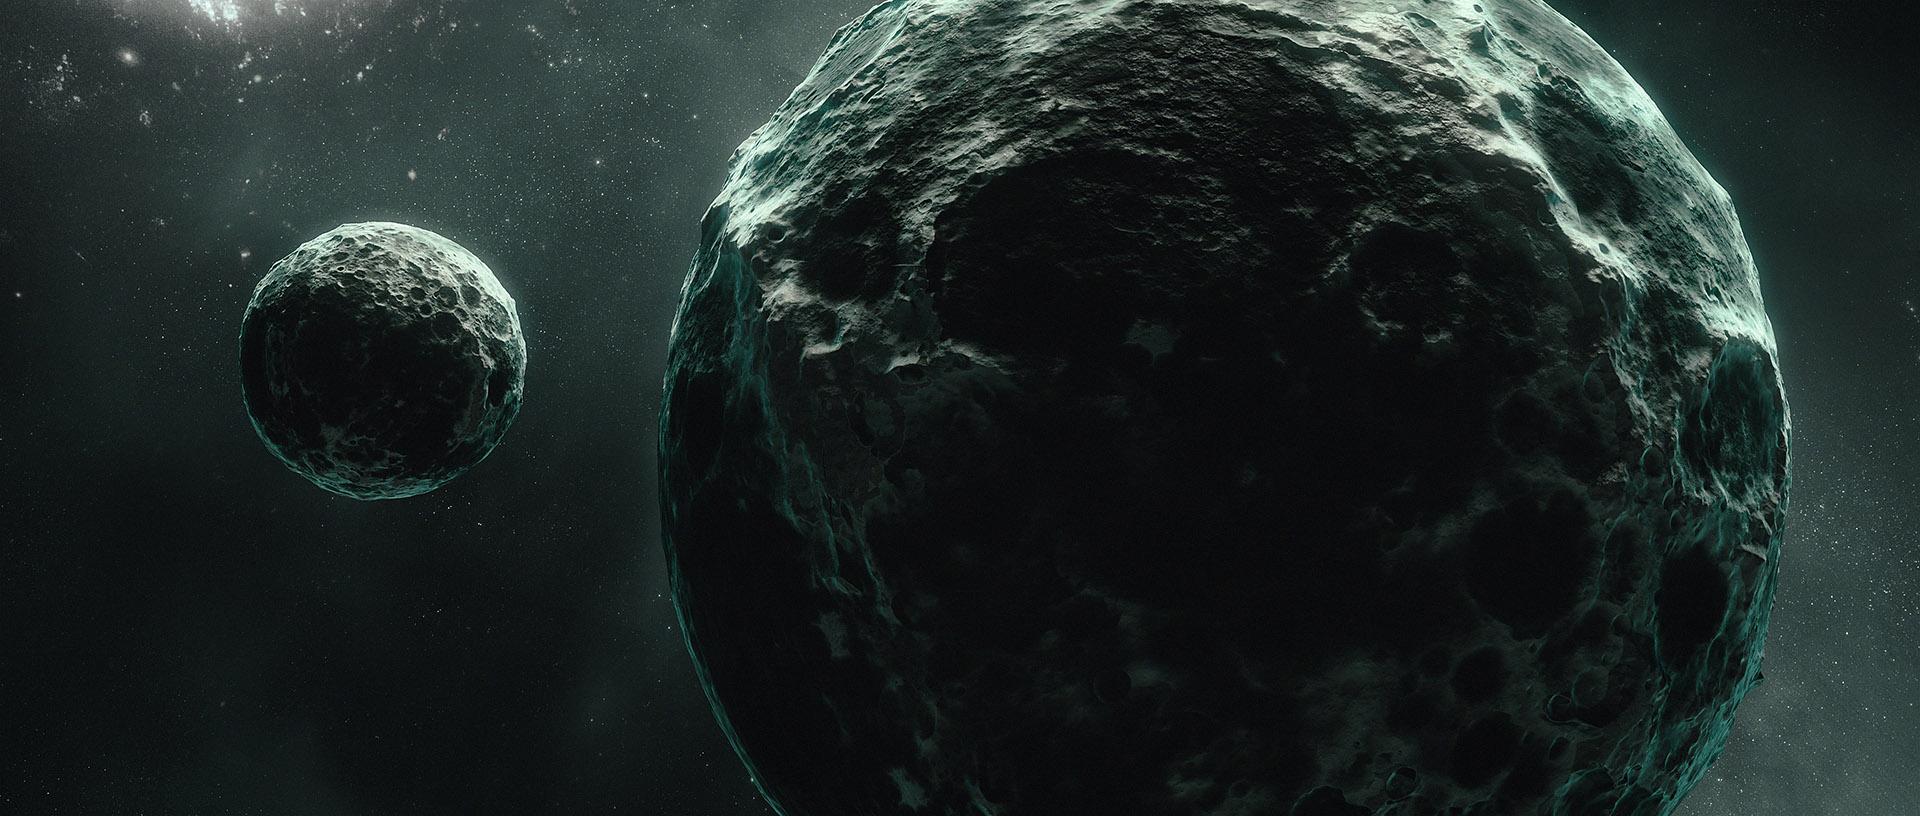 moon planet in blender